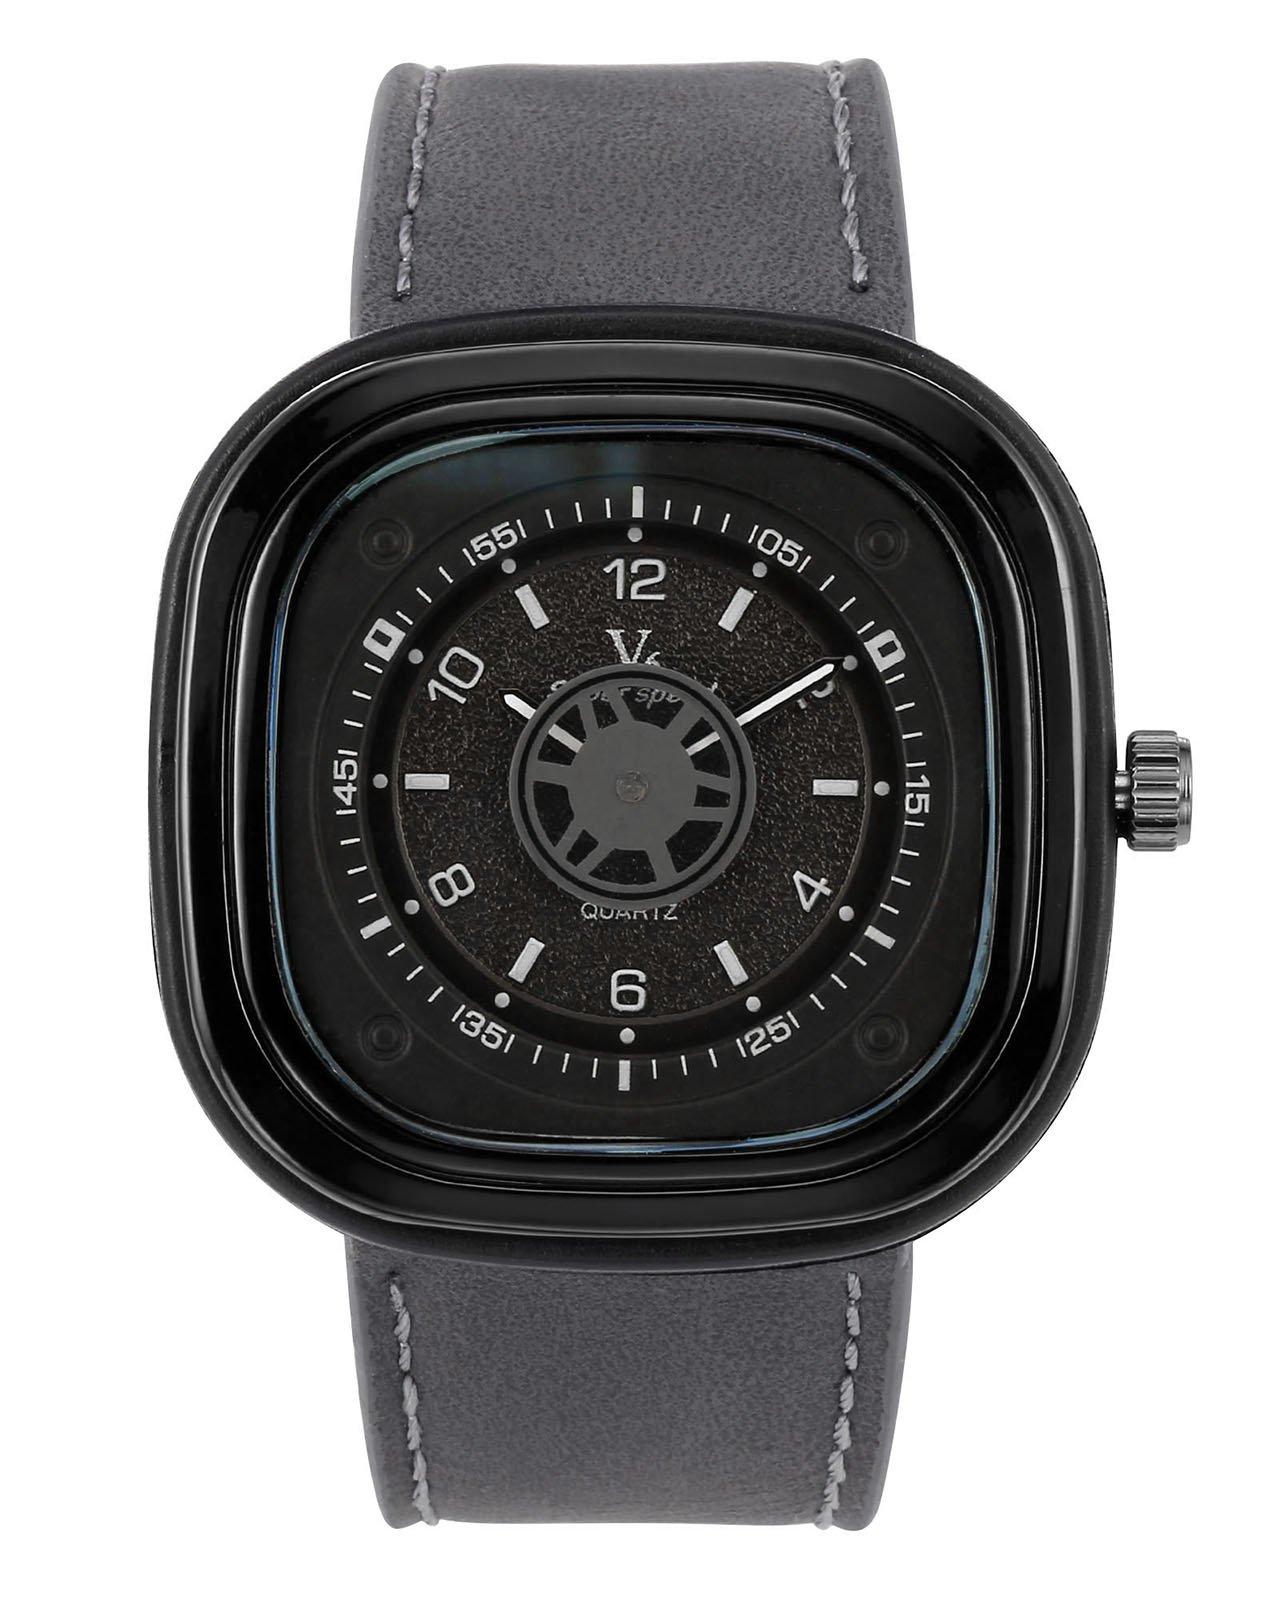 JSDDE Uhren,Retro Herren Armbanduhr 3ATM Wasserdichte Armbanduhr Lederarmband Zahnrad Sekundenzeiger Quadrat Quarzuhr,Silbergrau